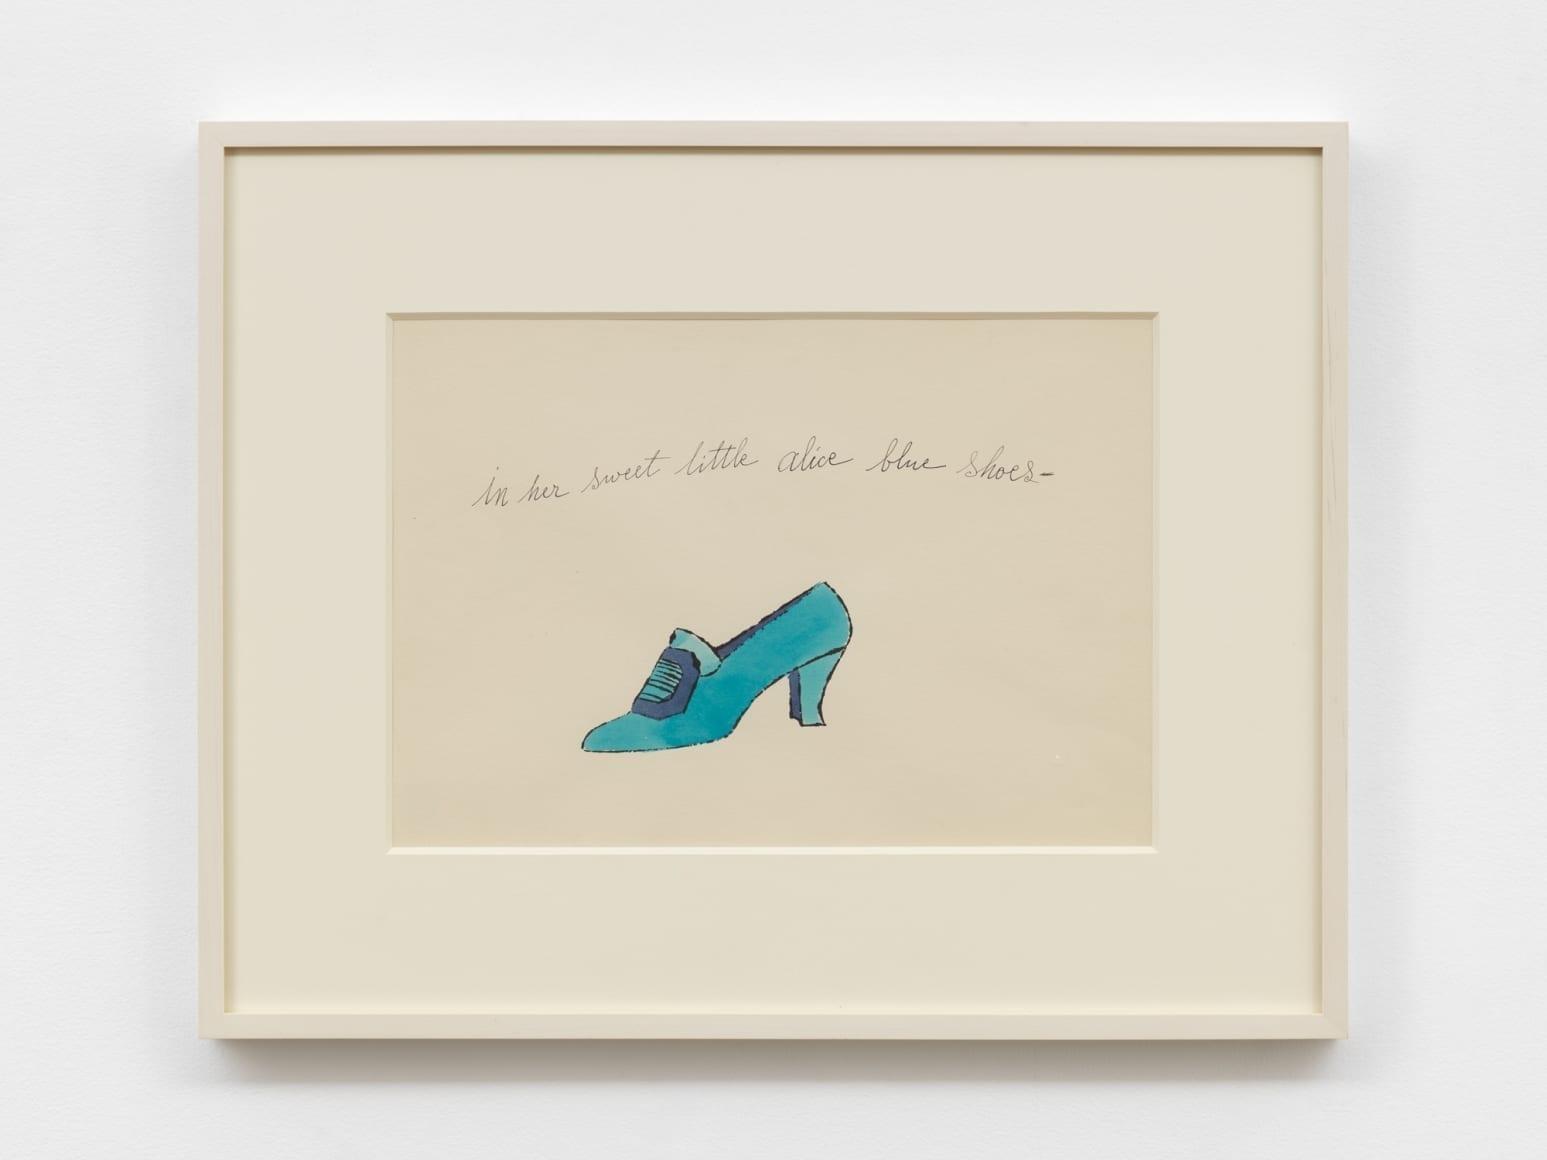 In Her Sweet Little Alice Blue Shoes, 1955